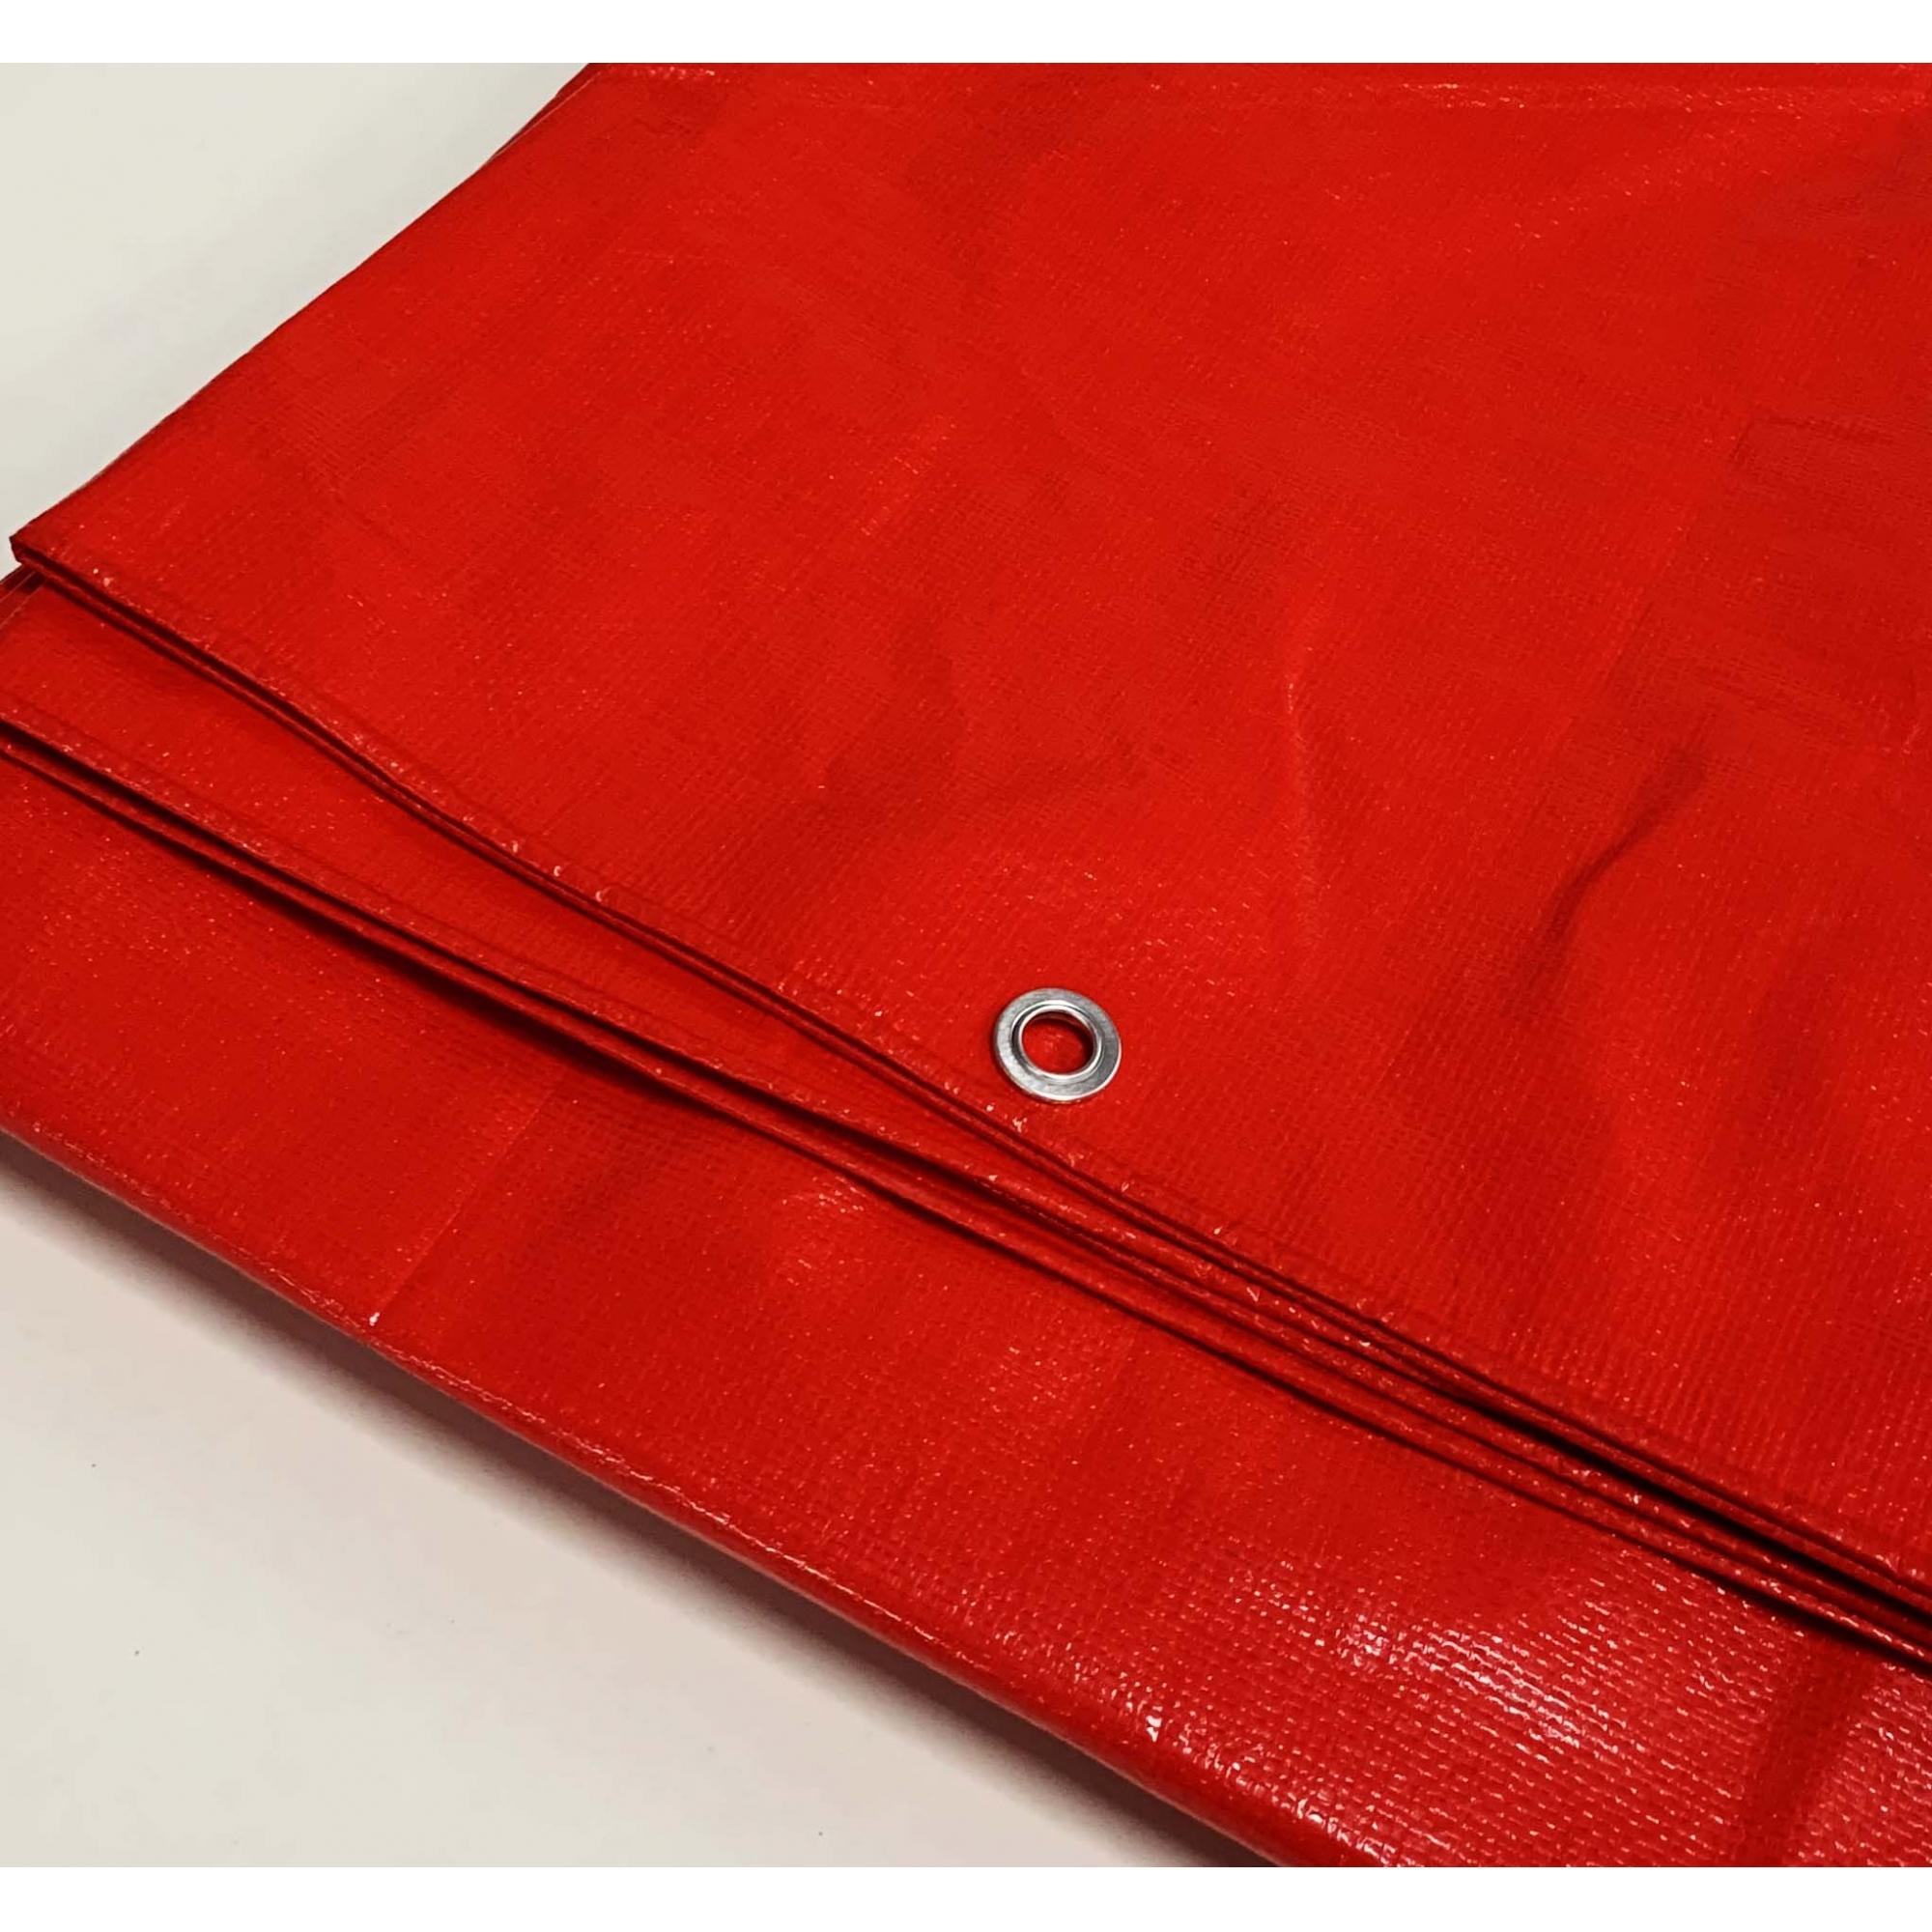 Prolona leve agric vermelho 2x2m